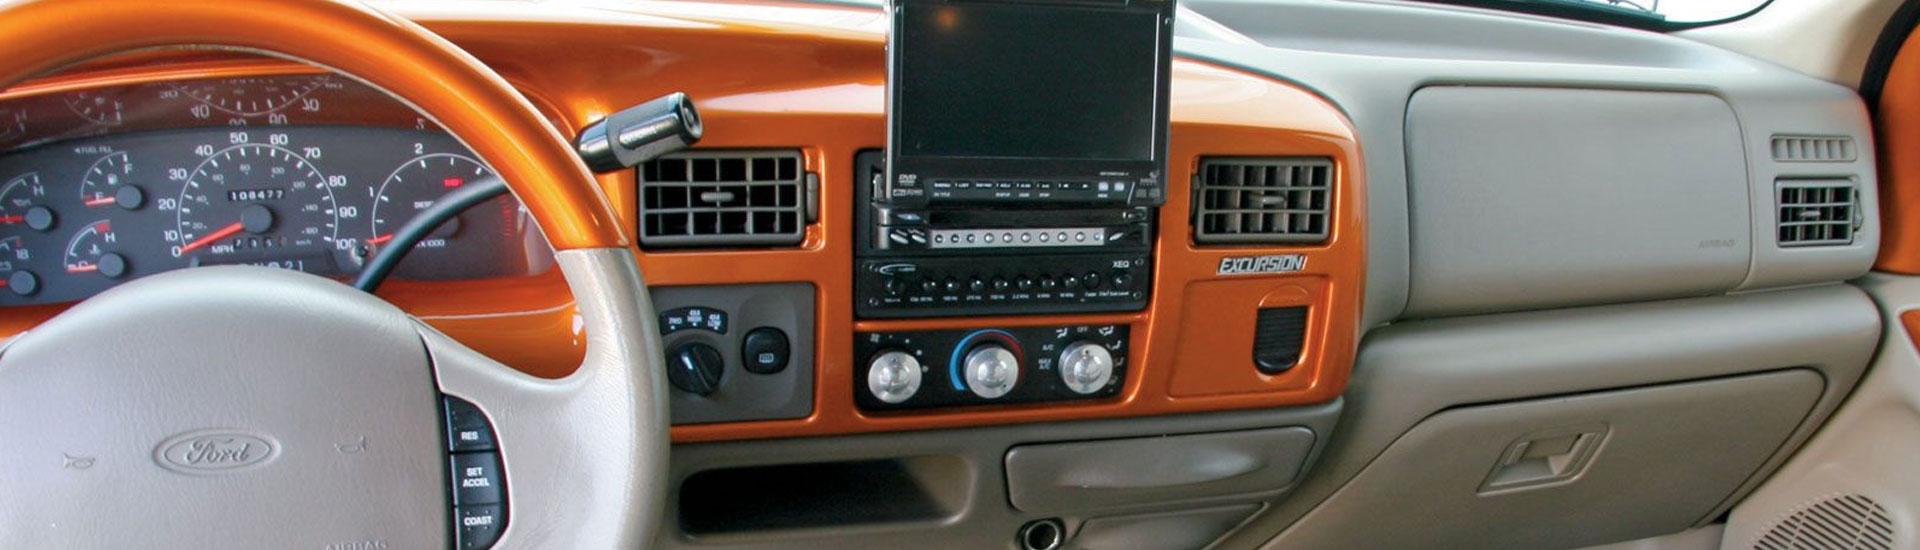 Ford Excursion Dash Kits